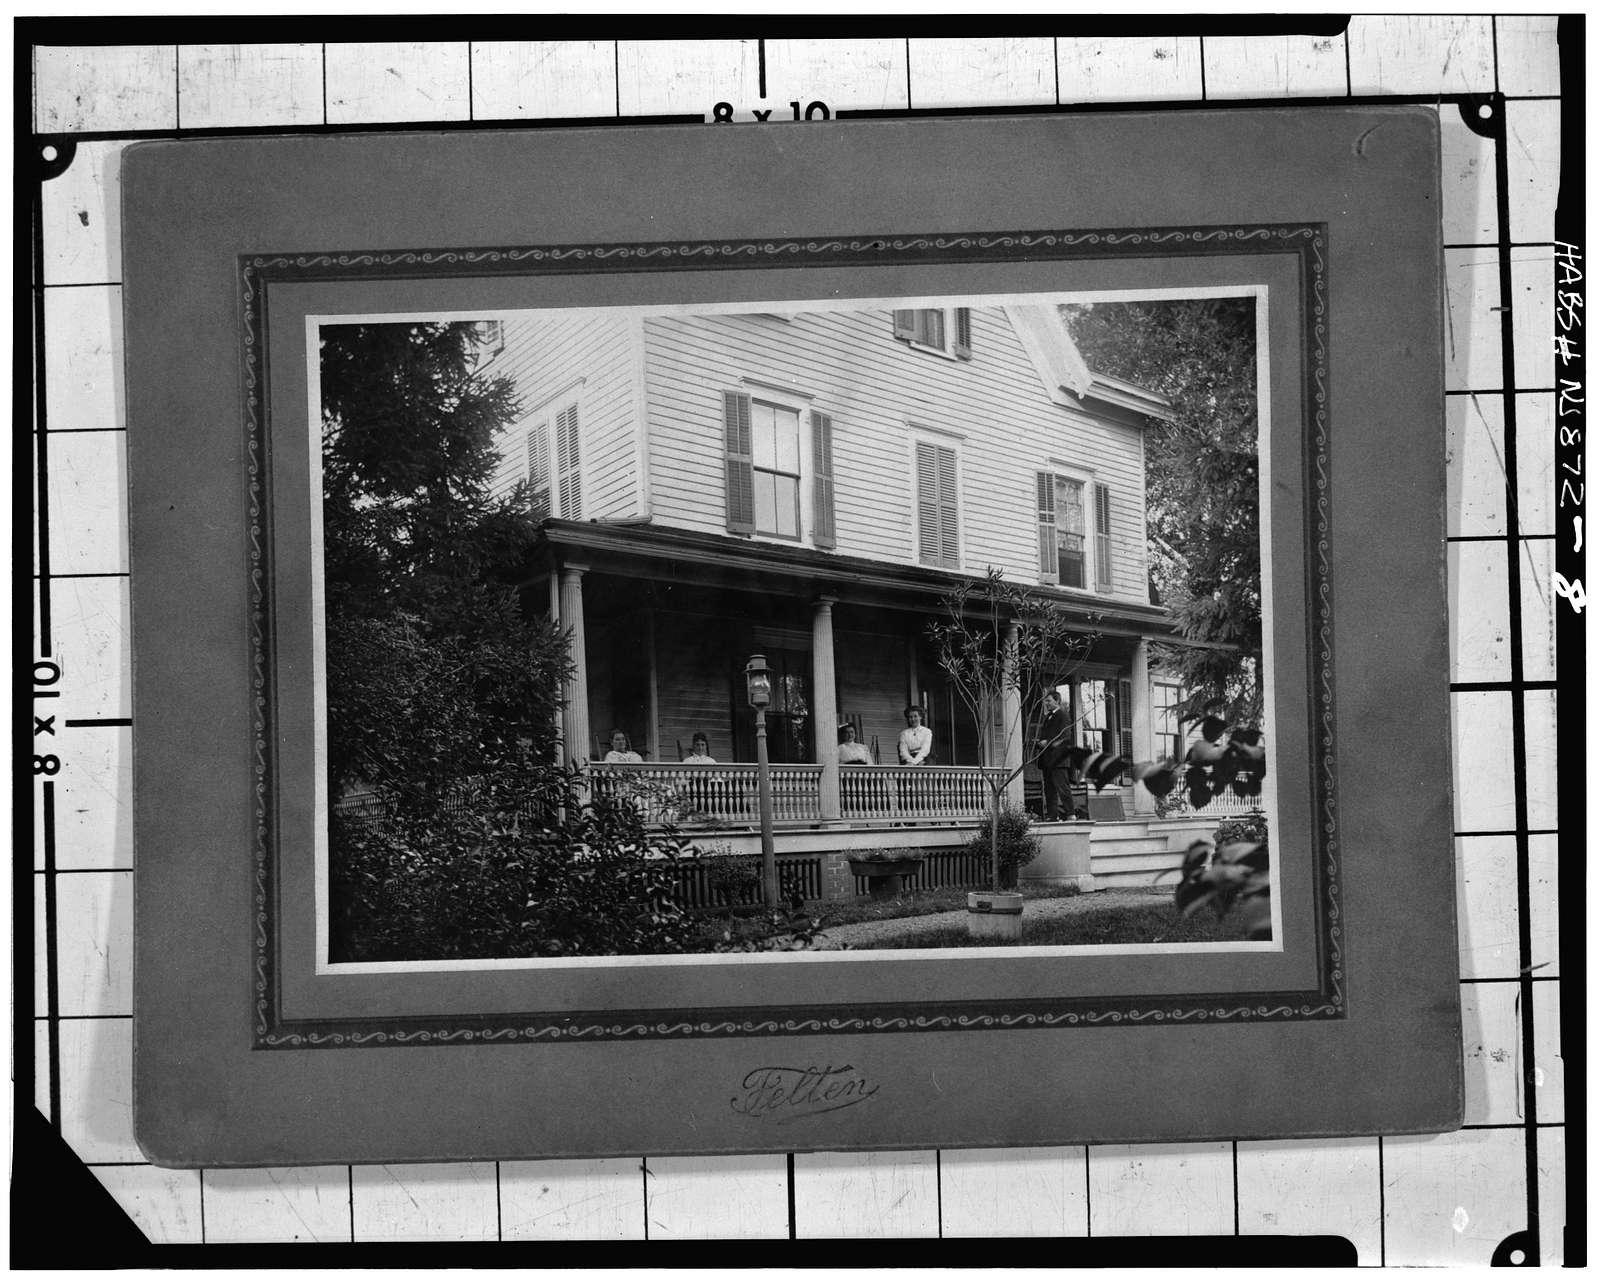 Sears House, 958 Route 23, Wayne, Passaic County, NJ